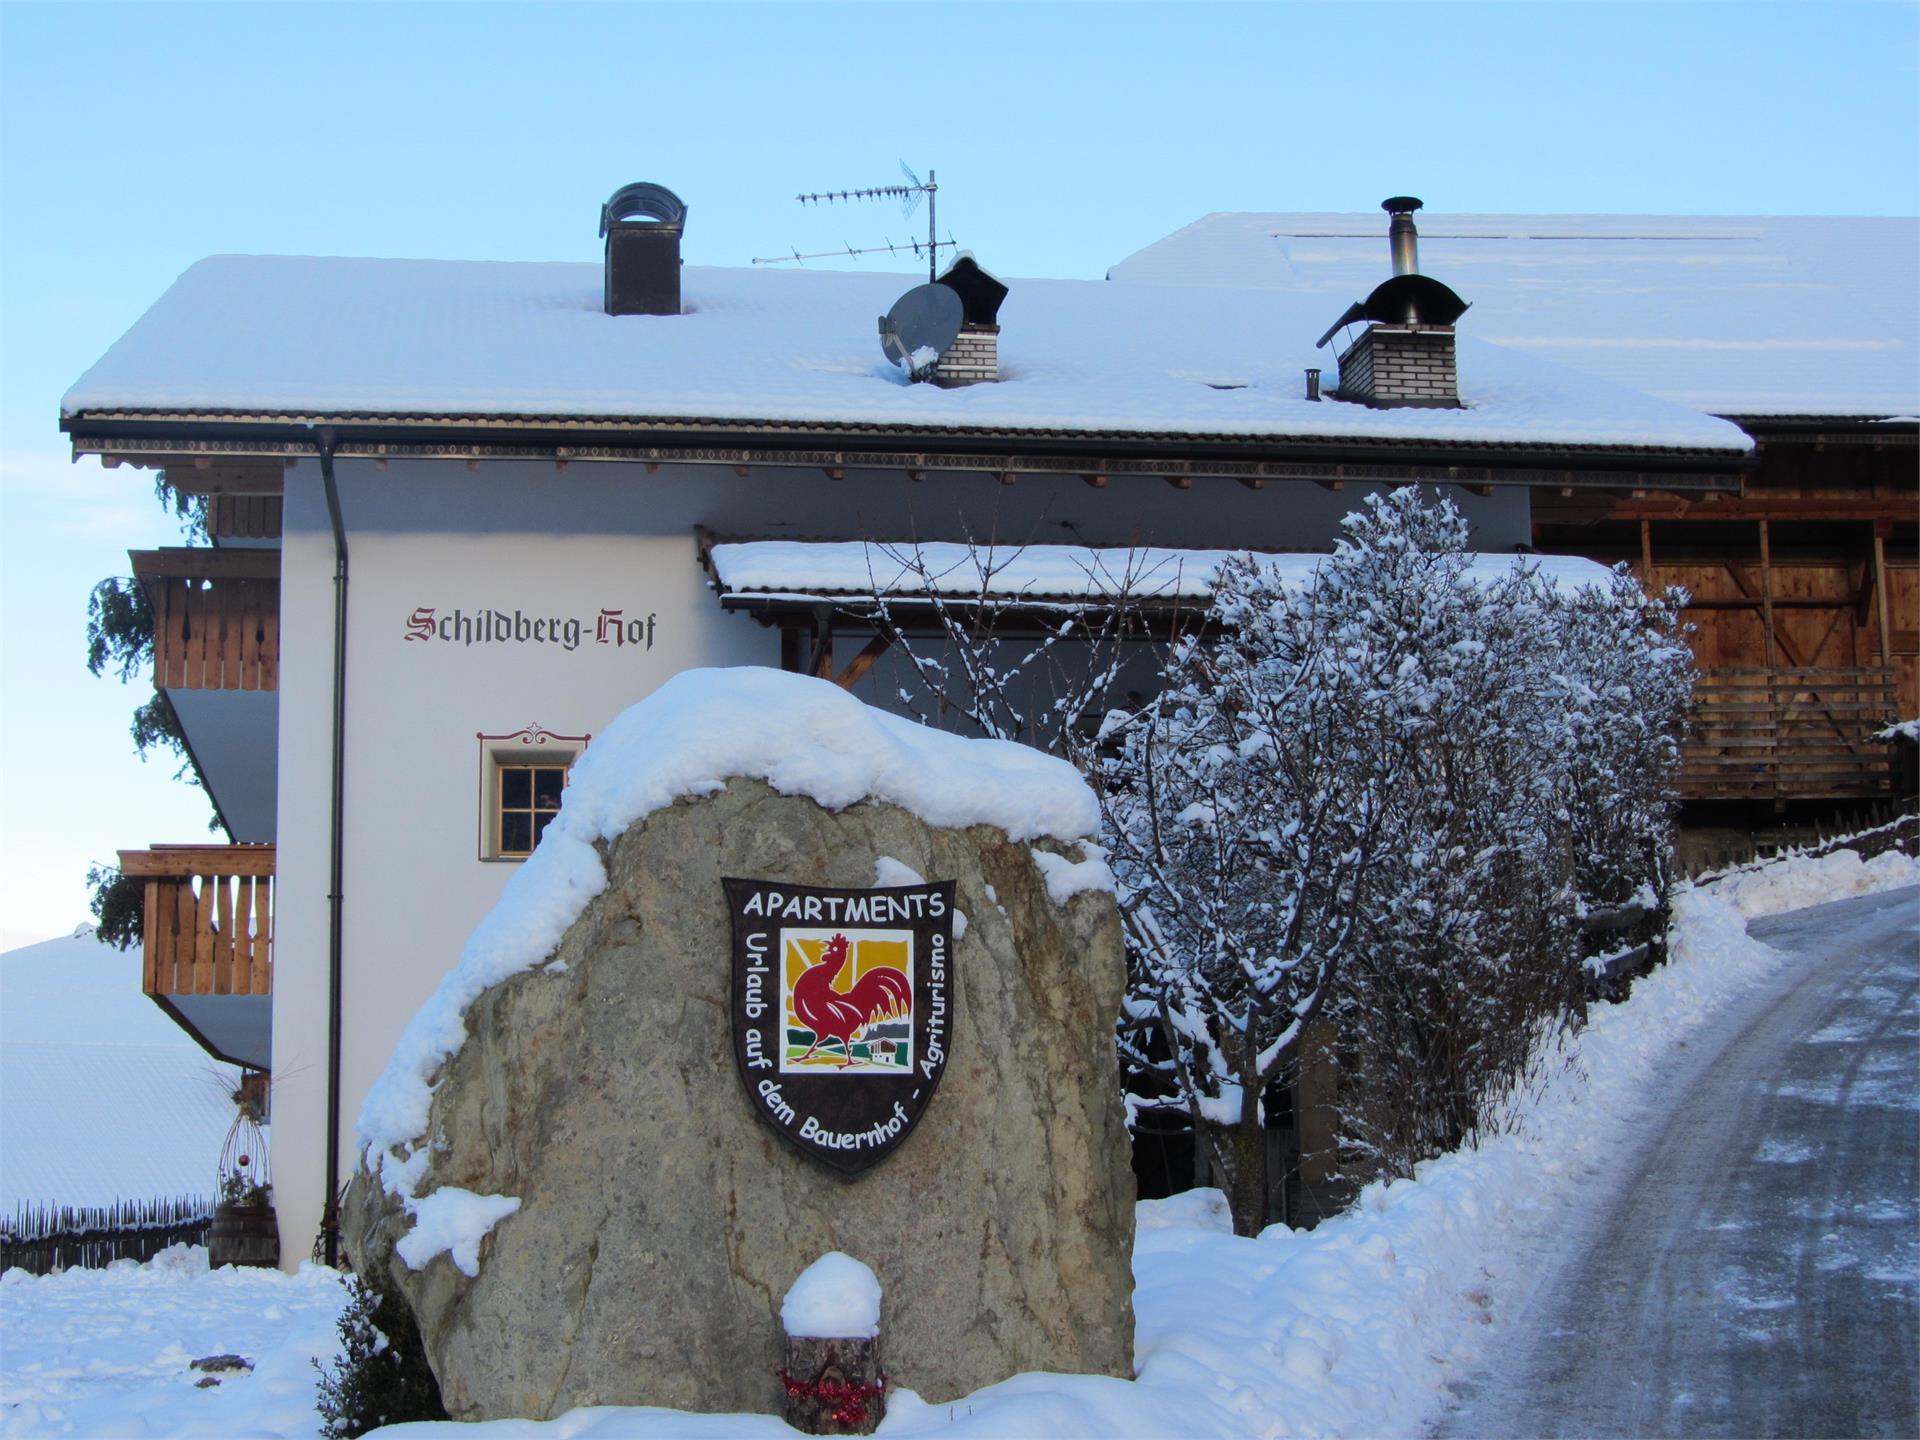 Schildberg